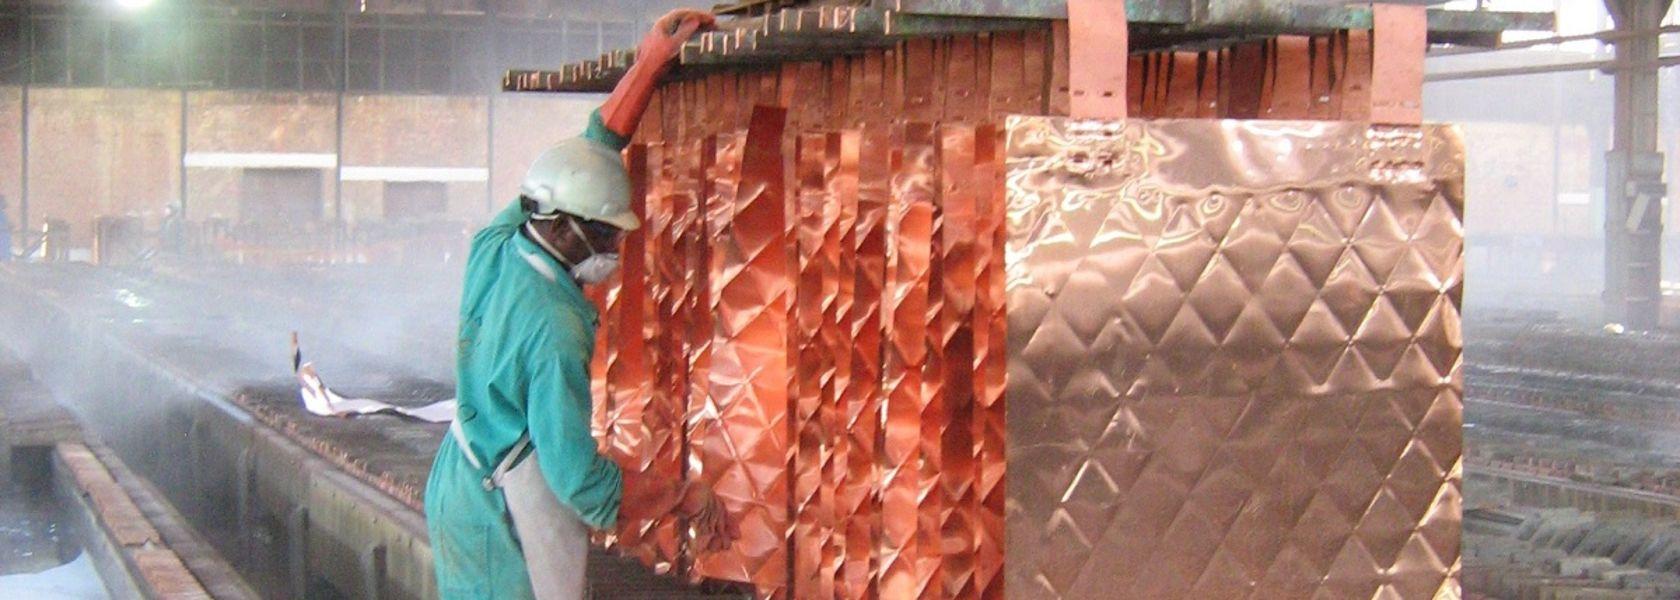 Glencore drops copper guidance - Mining Journal